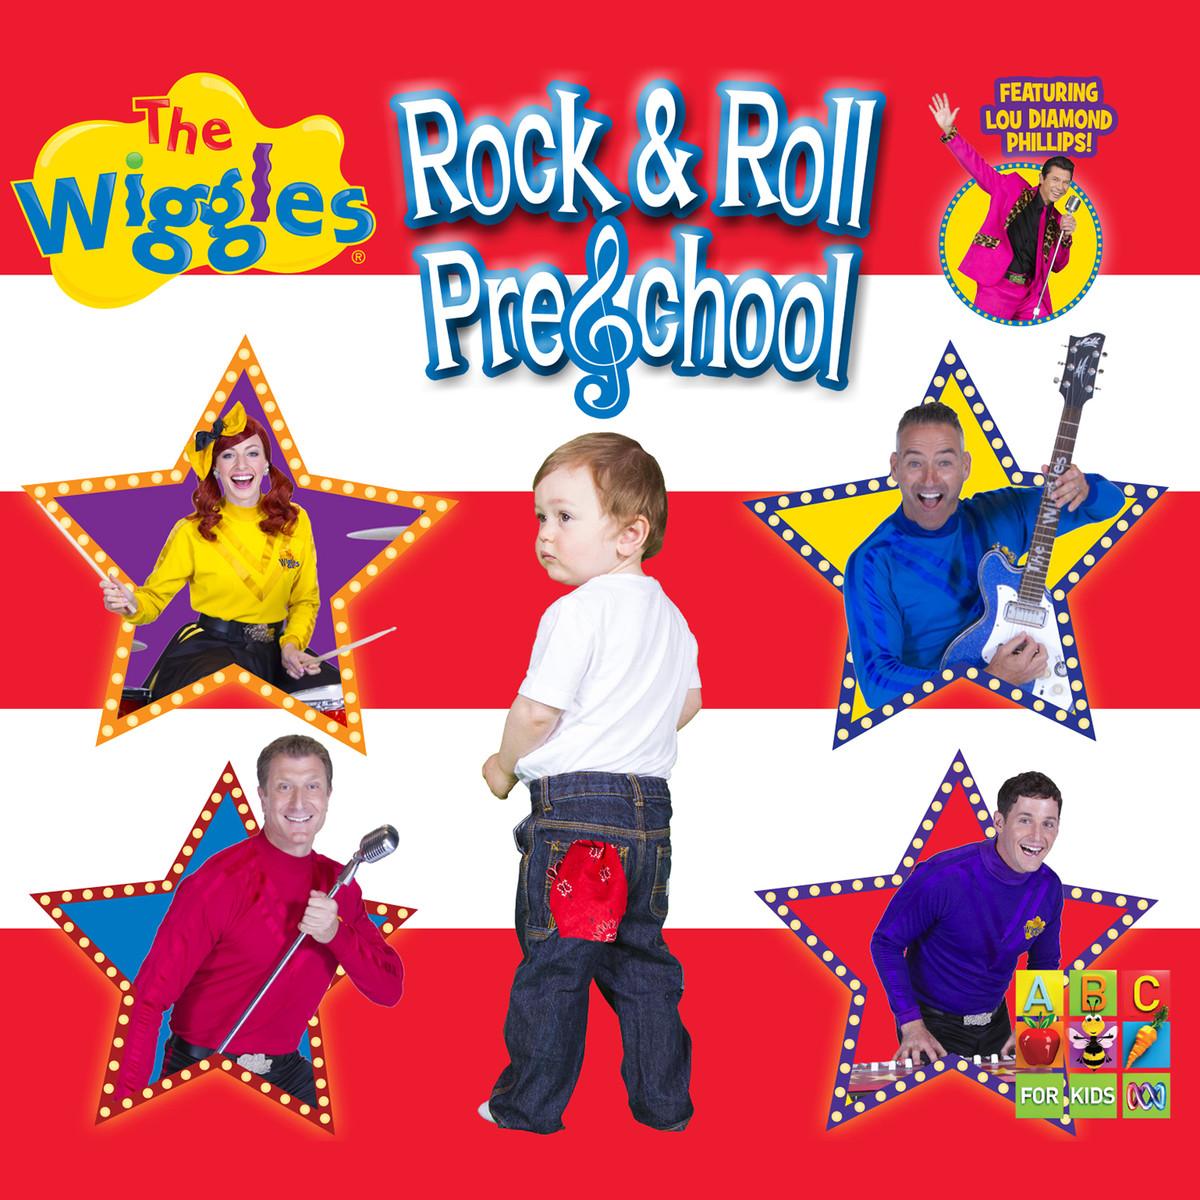 Rock & Roll Preschool (album)